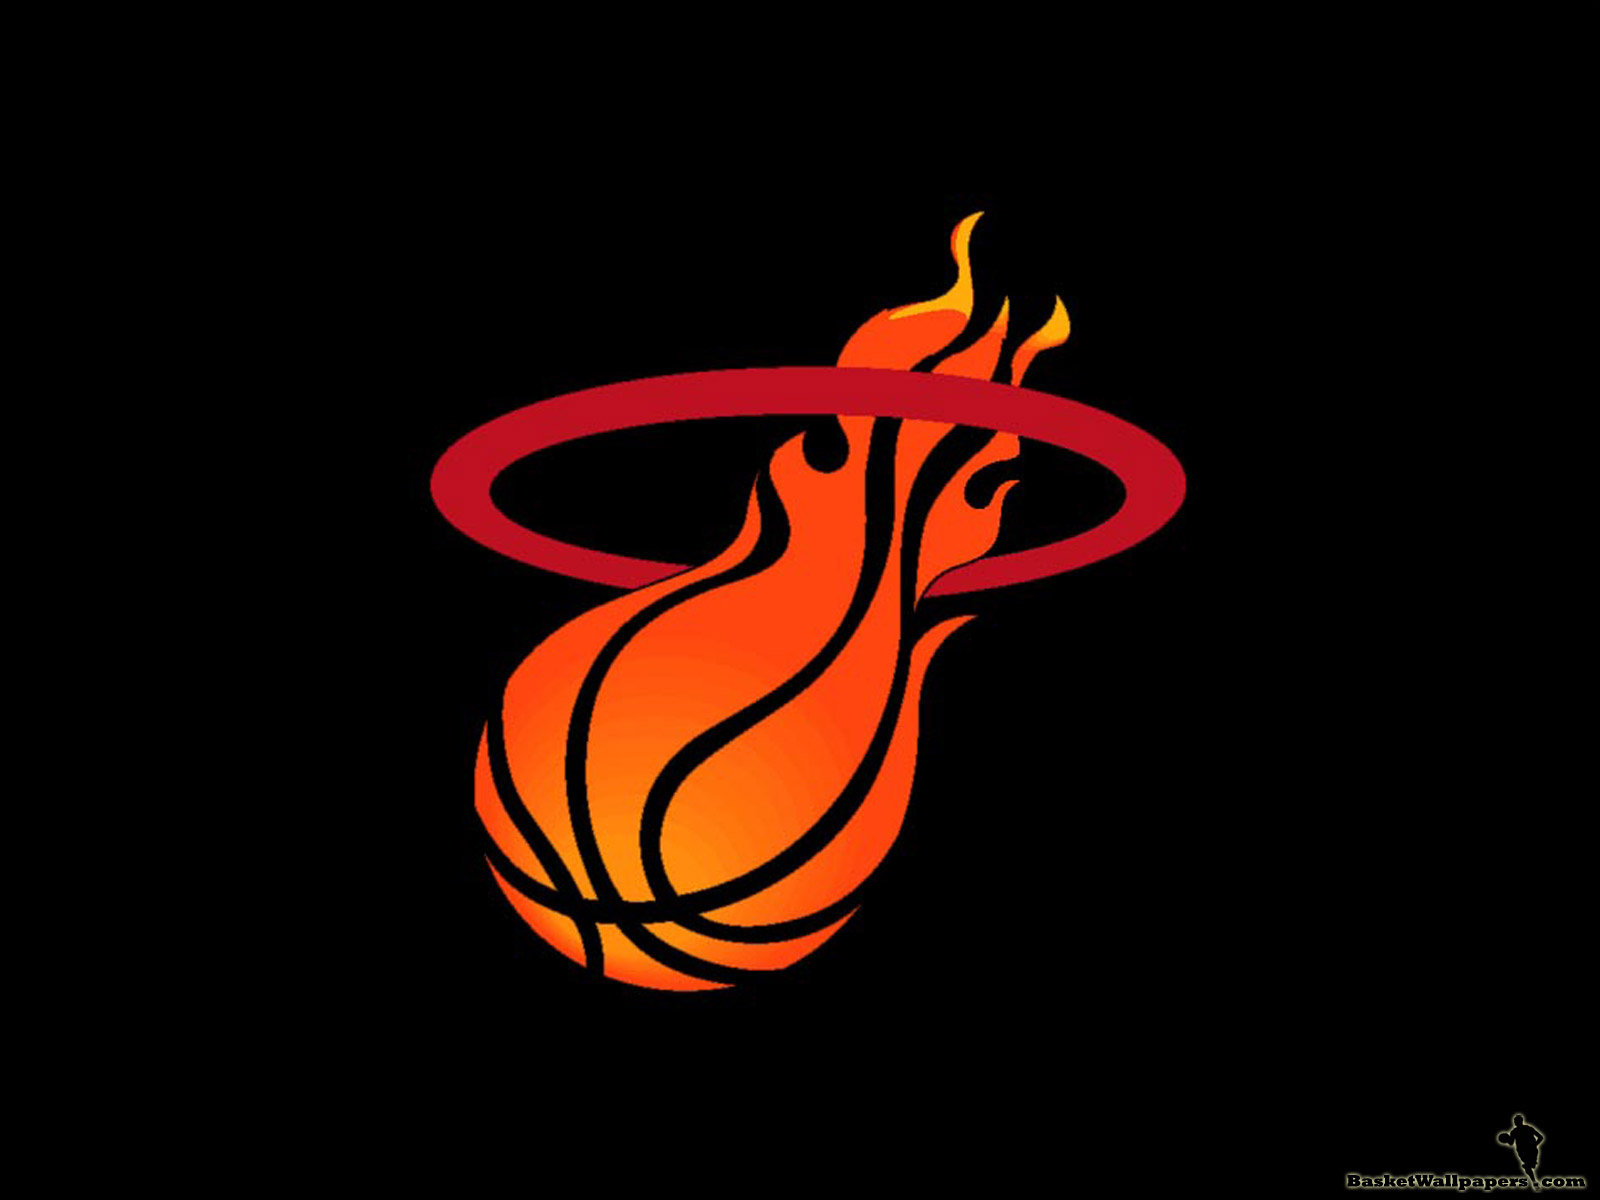 http://4.bp.blogspot.com/-Wu9uIZesE0M/UDur-MjpxnI/AAAAAAAAABM/ZtdkYkiTRis/s1600/Miami-Heat-Logo-Wallpaper.jpg